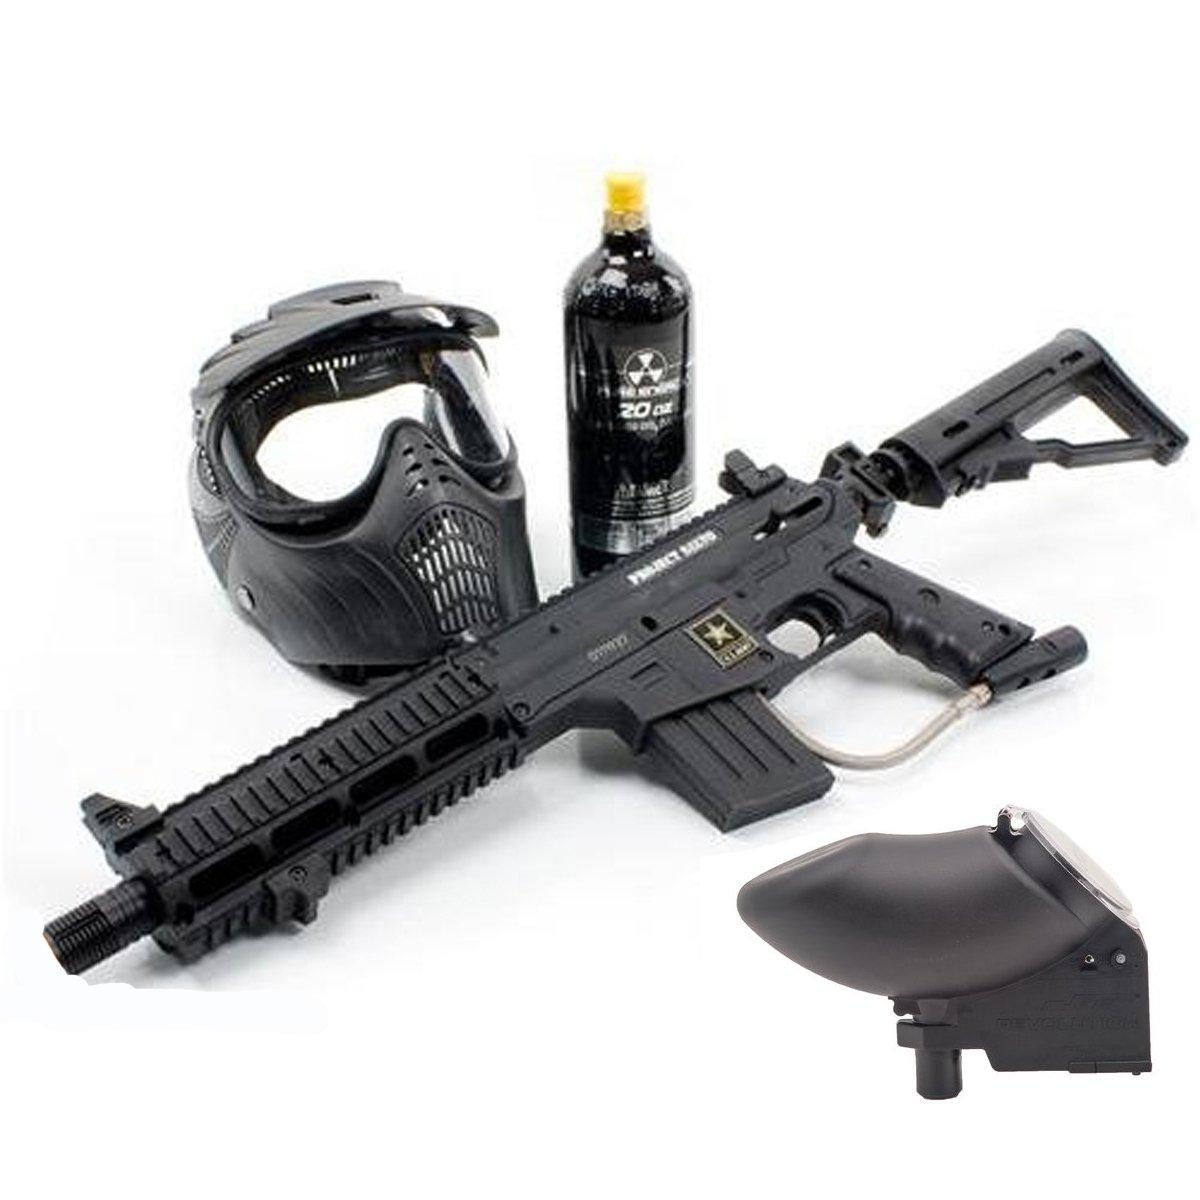 Us Army Project Salvo Revolution Mask 20oz Tank Tippmann 98 Flatline Barrel Manual Paintball Guns Sports Outdoors